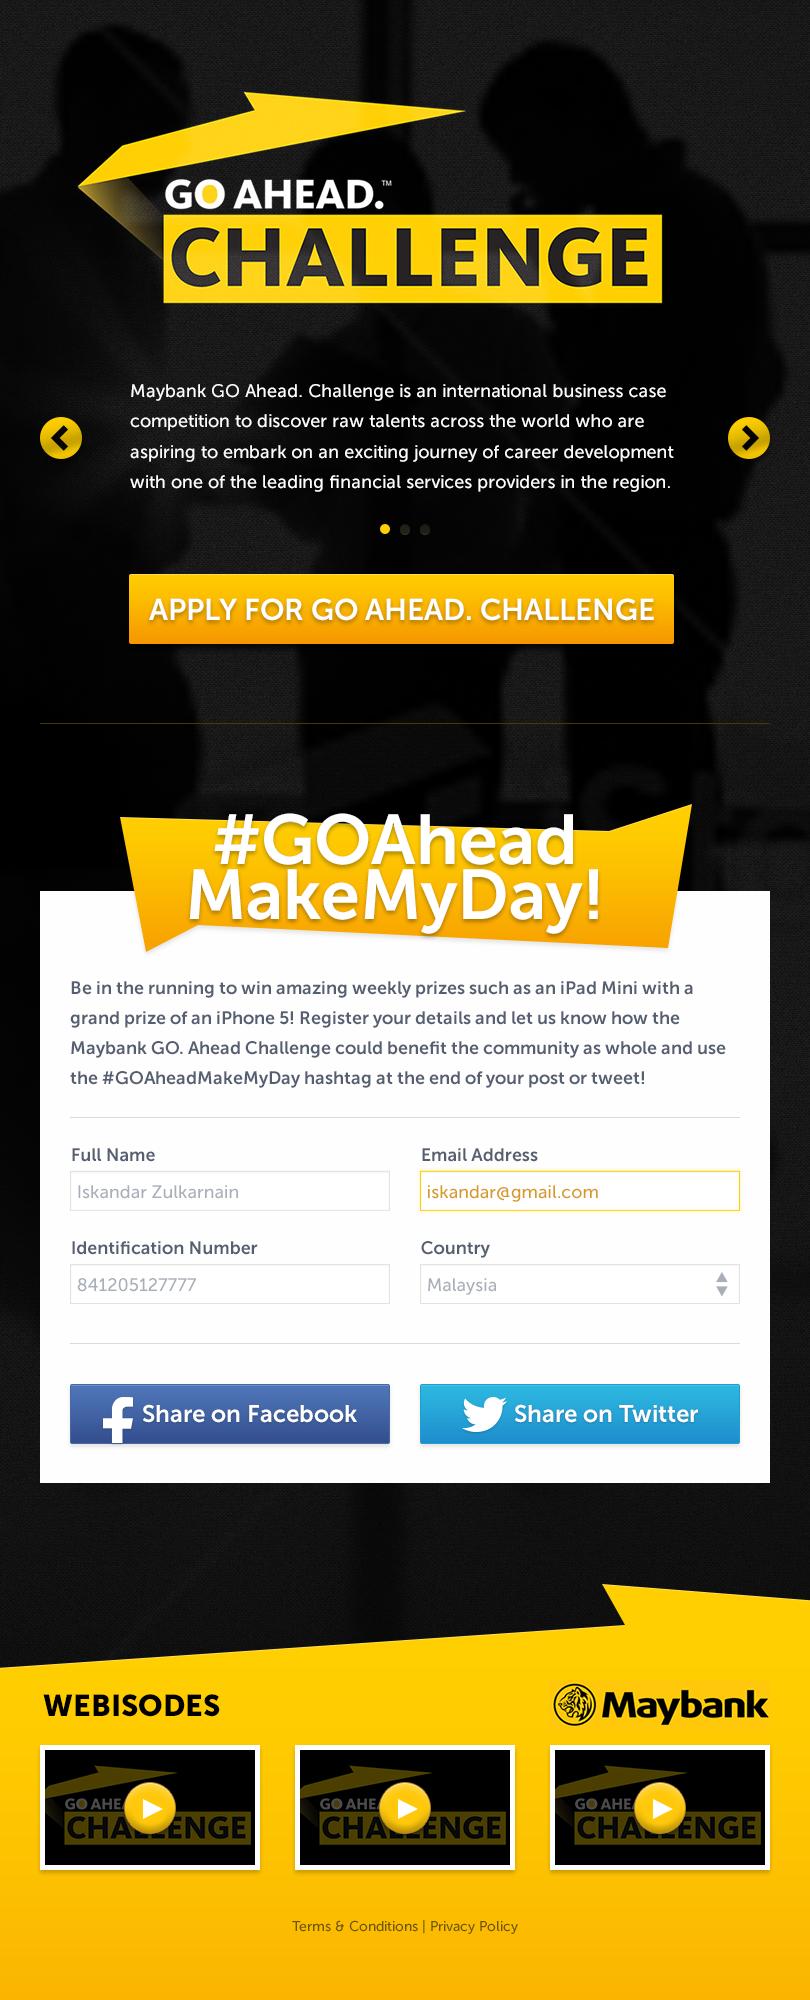 Maybank GO Ahead. Challenge 2013 - register